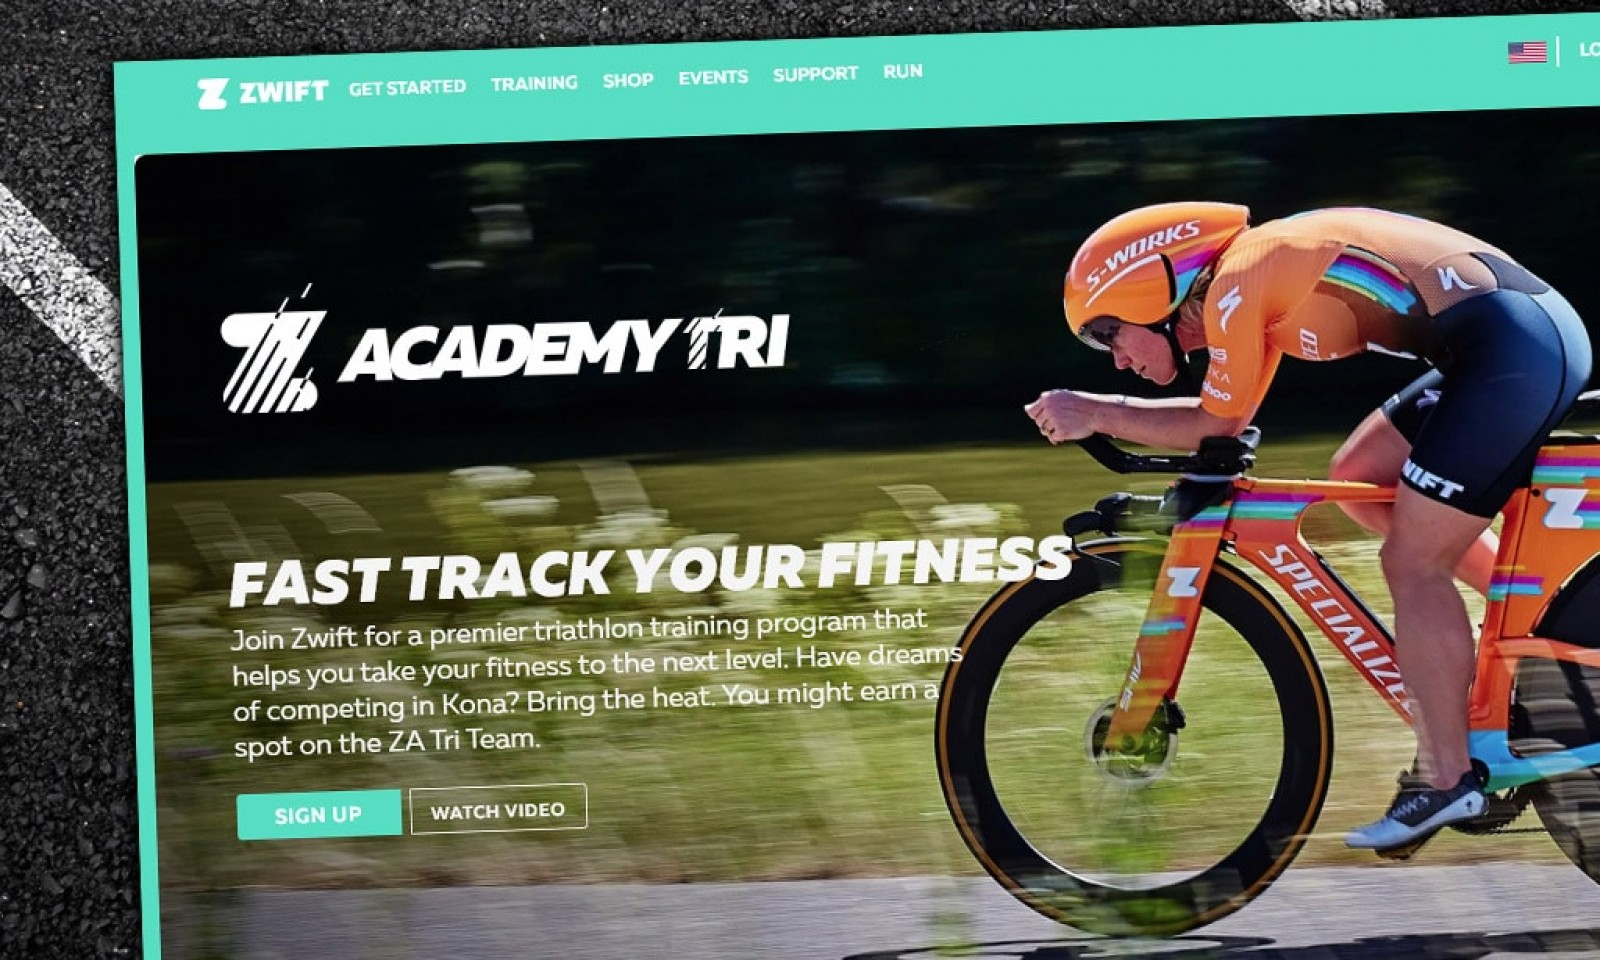 zwift-academy-van-der-poel-alpecin/